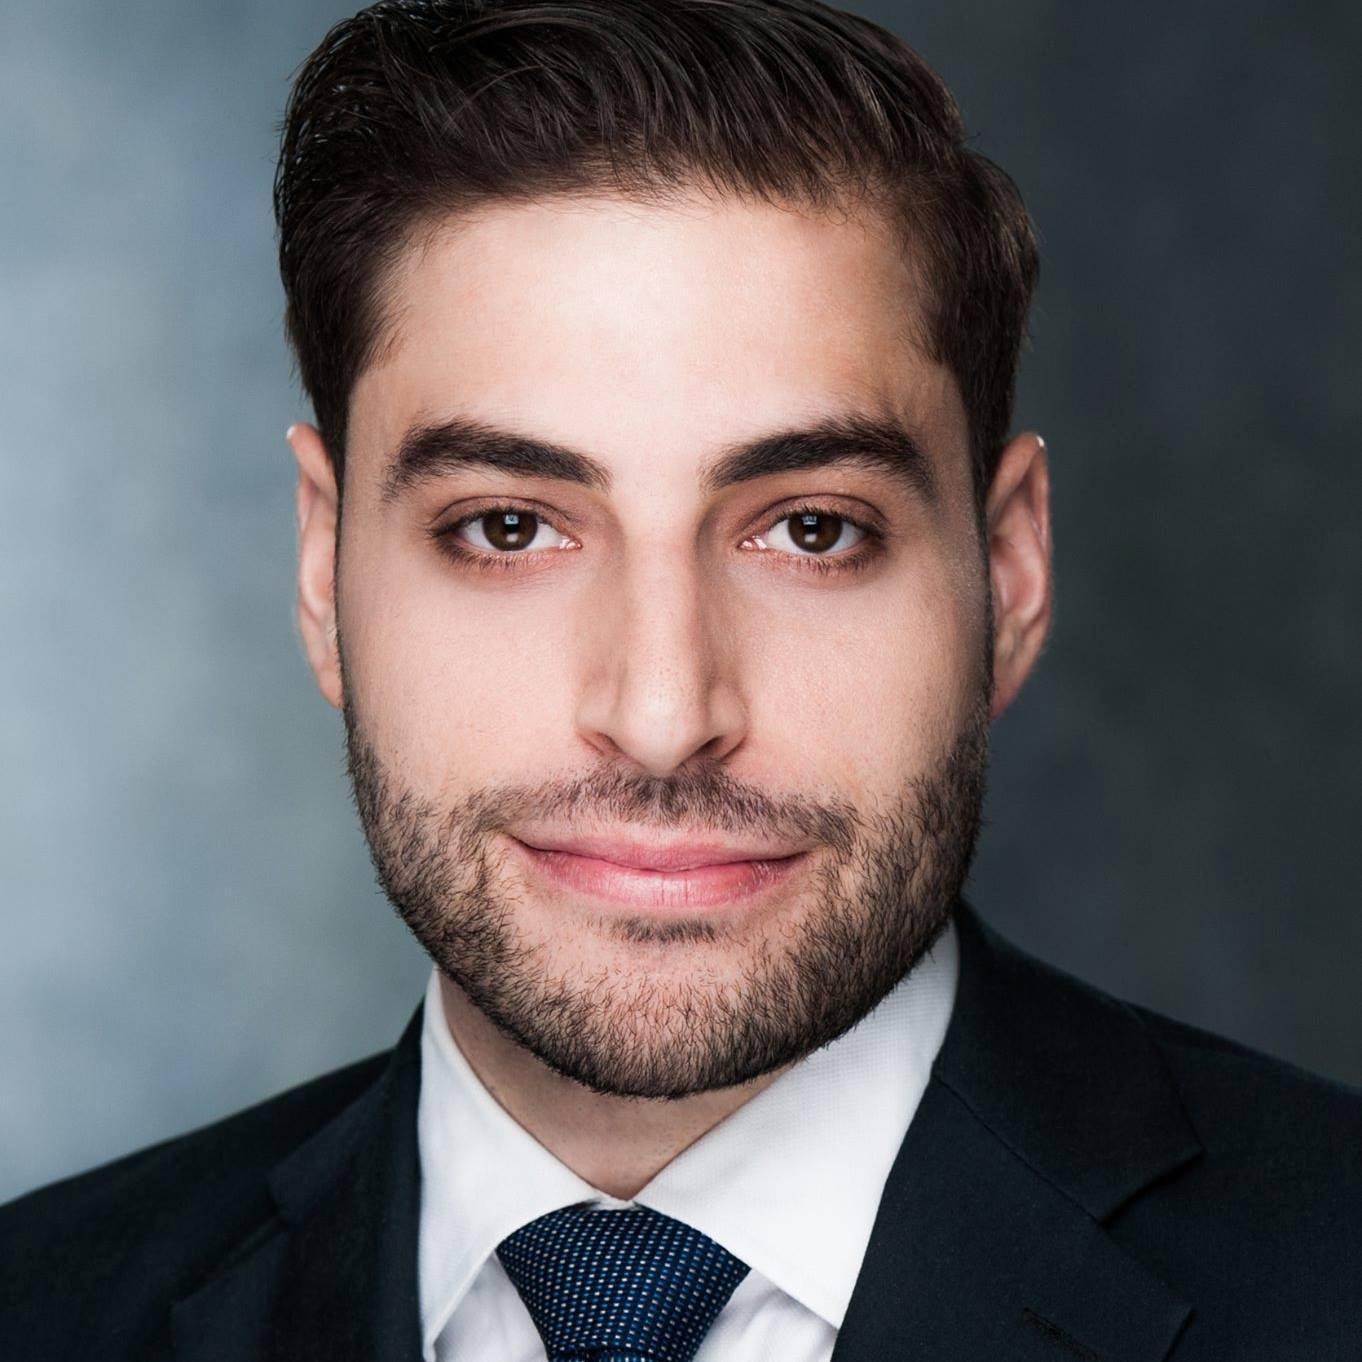 PAUL HABIB  Your Financial Advisor